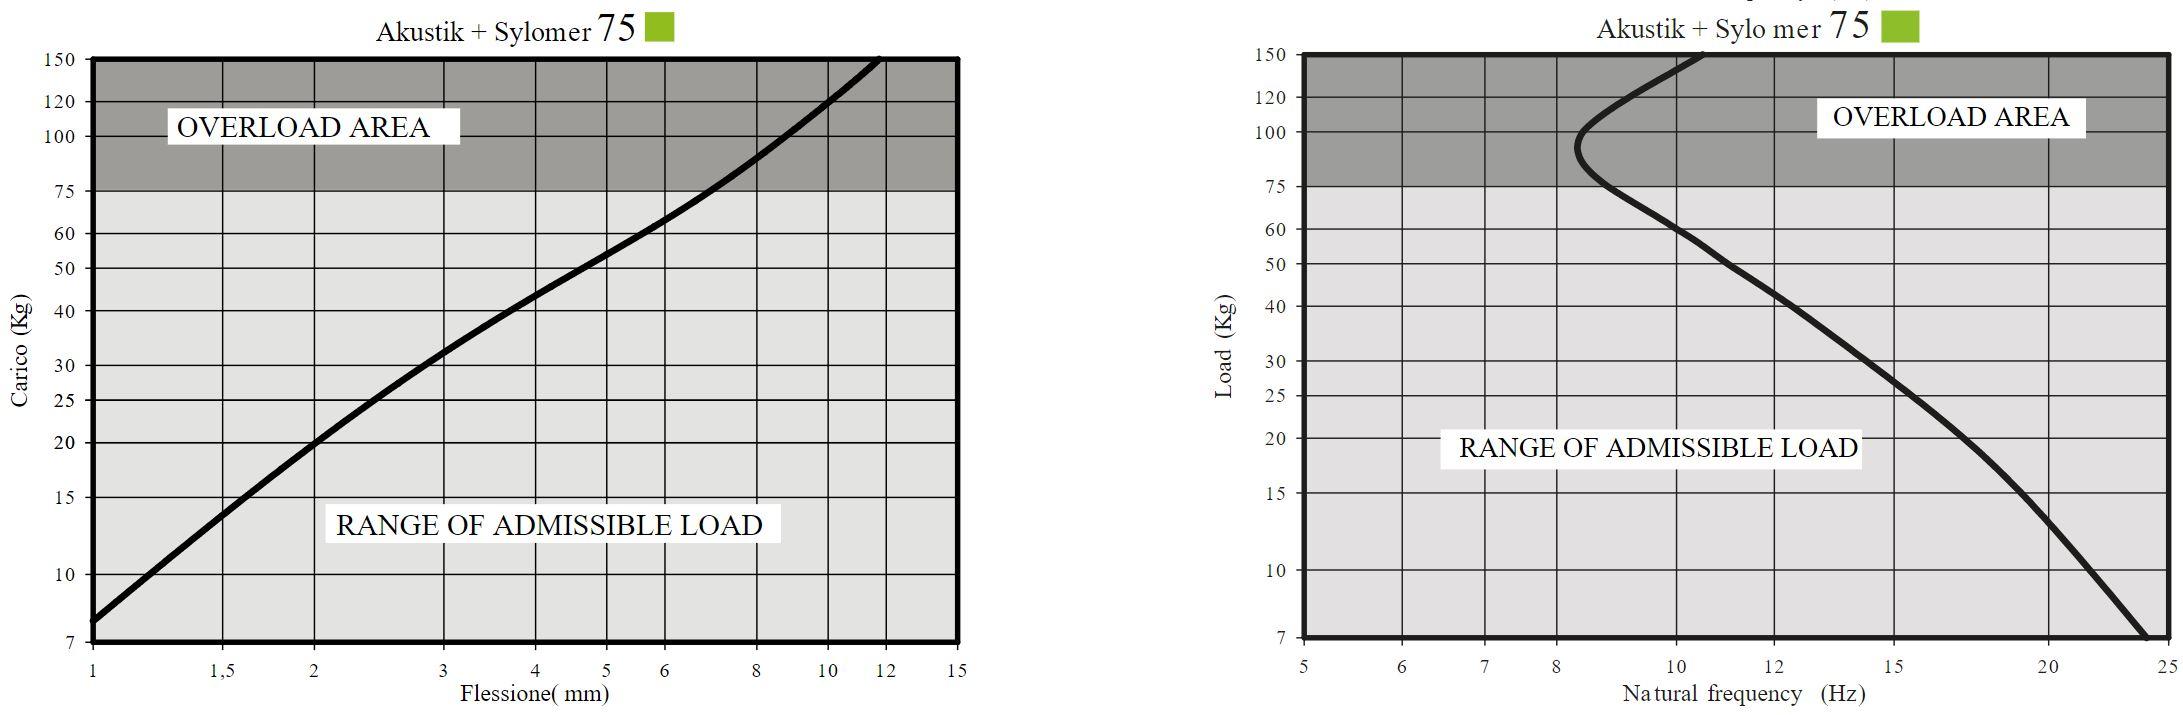 Akustik 4 high sylomer curve 2